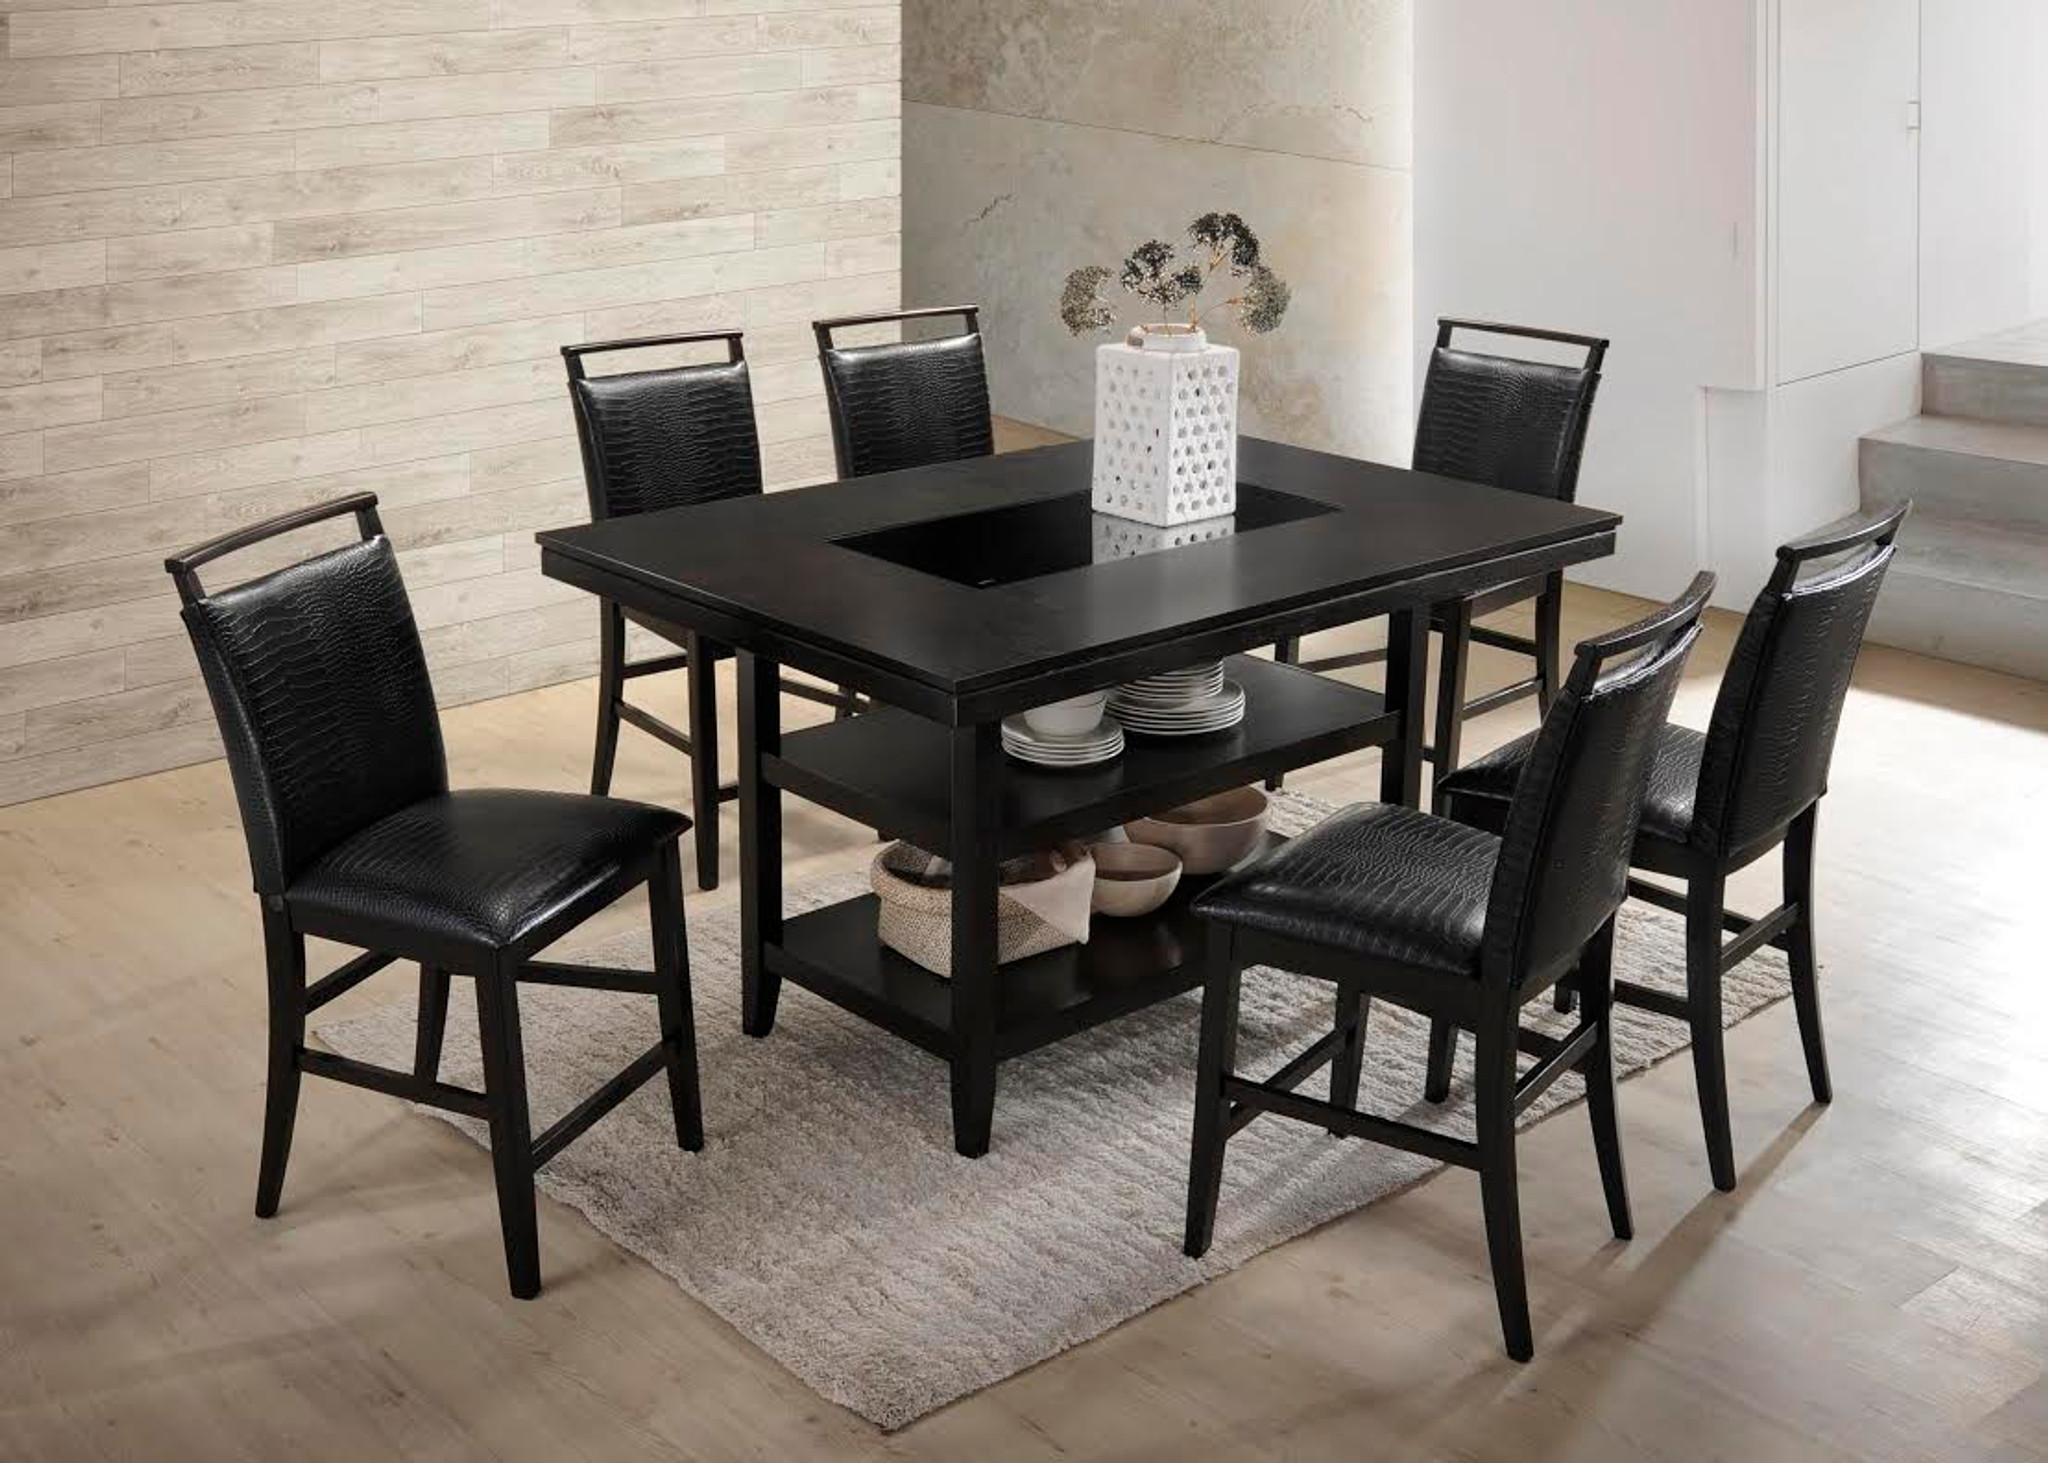 7pcs Black Counter Height Dining Table Set Black Crocodile Upholstery Kassa Mall Home Furniture